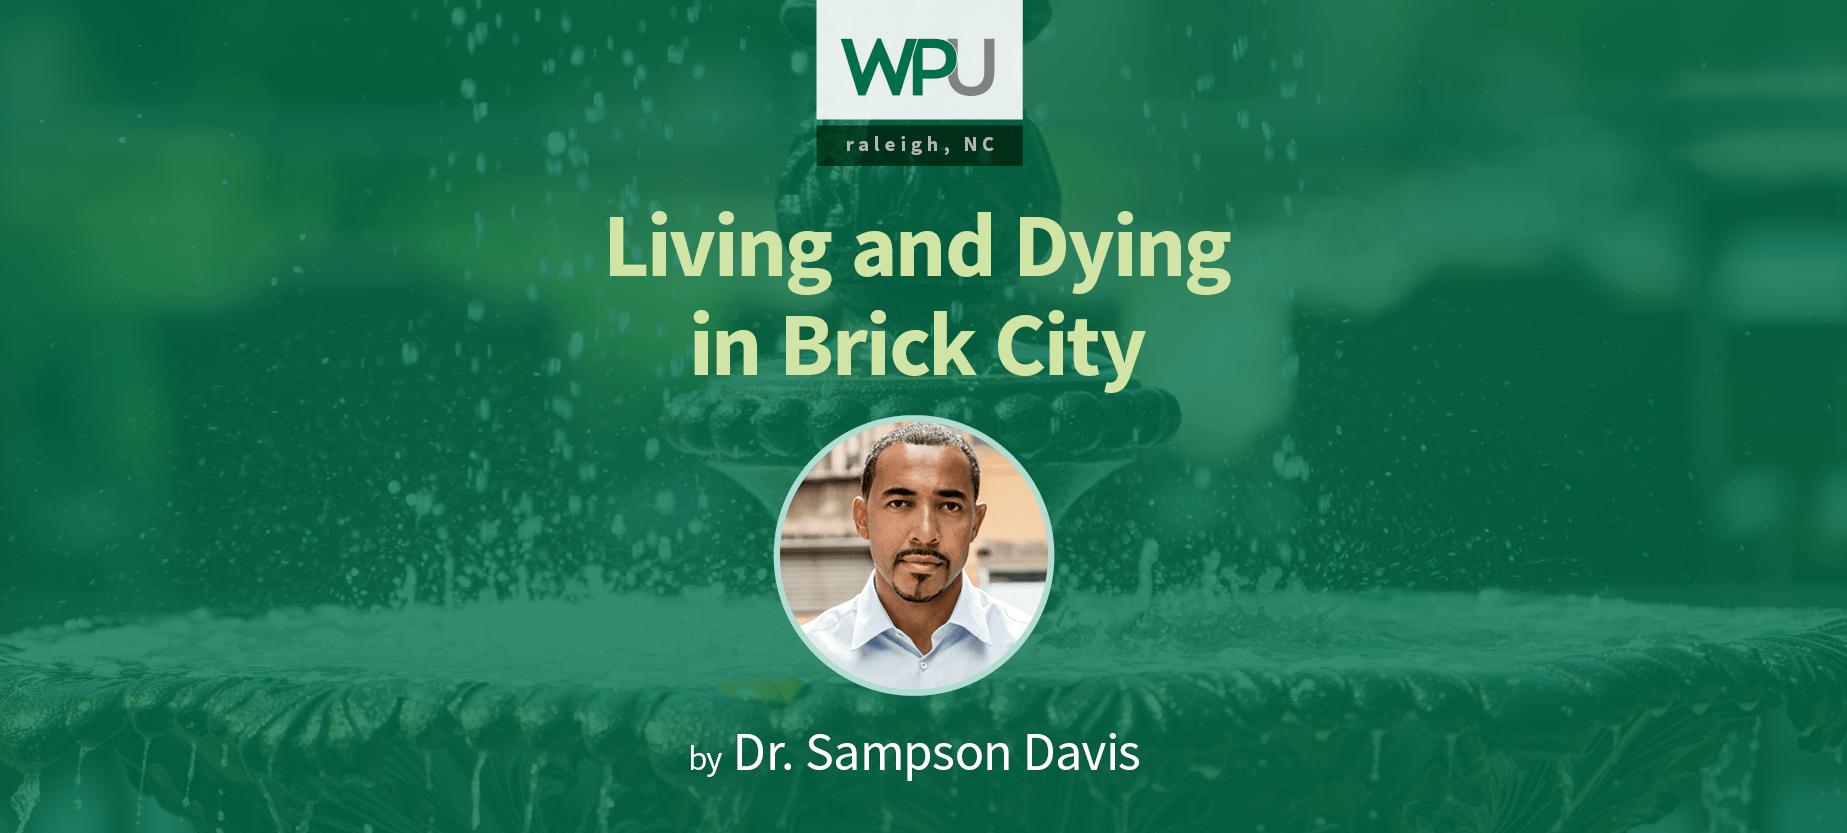 Award-Winning Author & Speaker, Dr. Sampson Davis, Comes to WPU, Wednesday, Sept. 6th